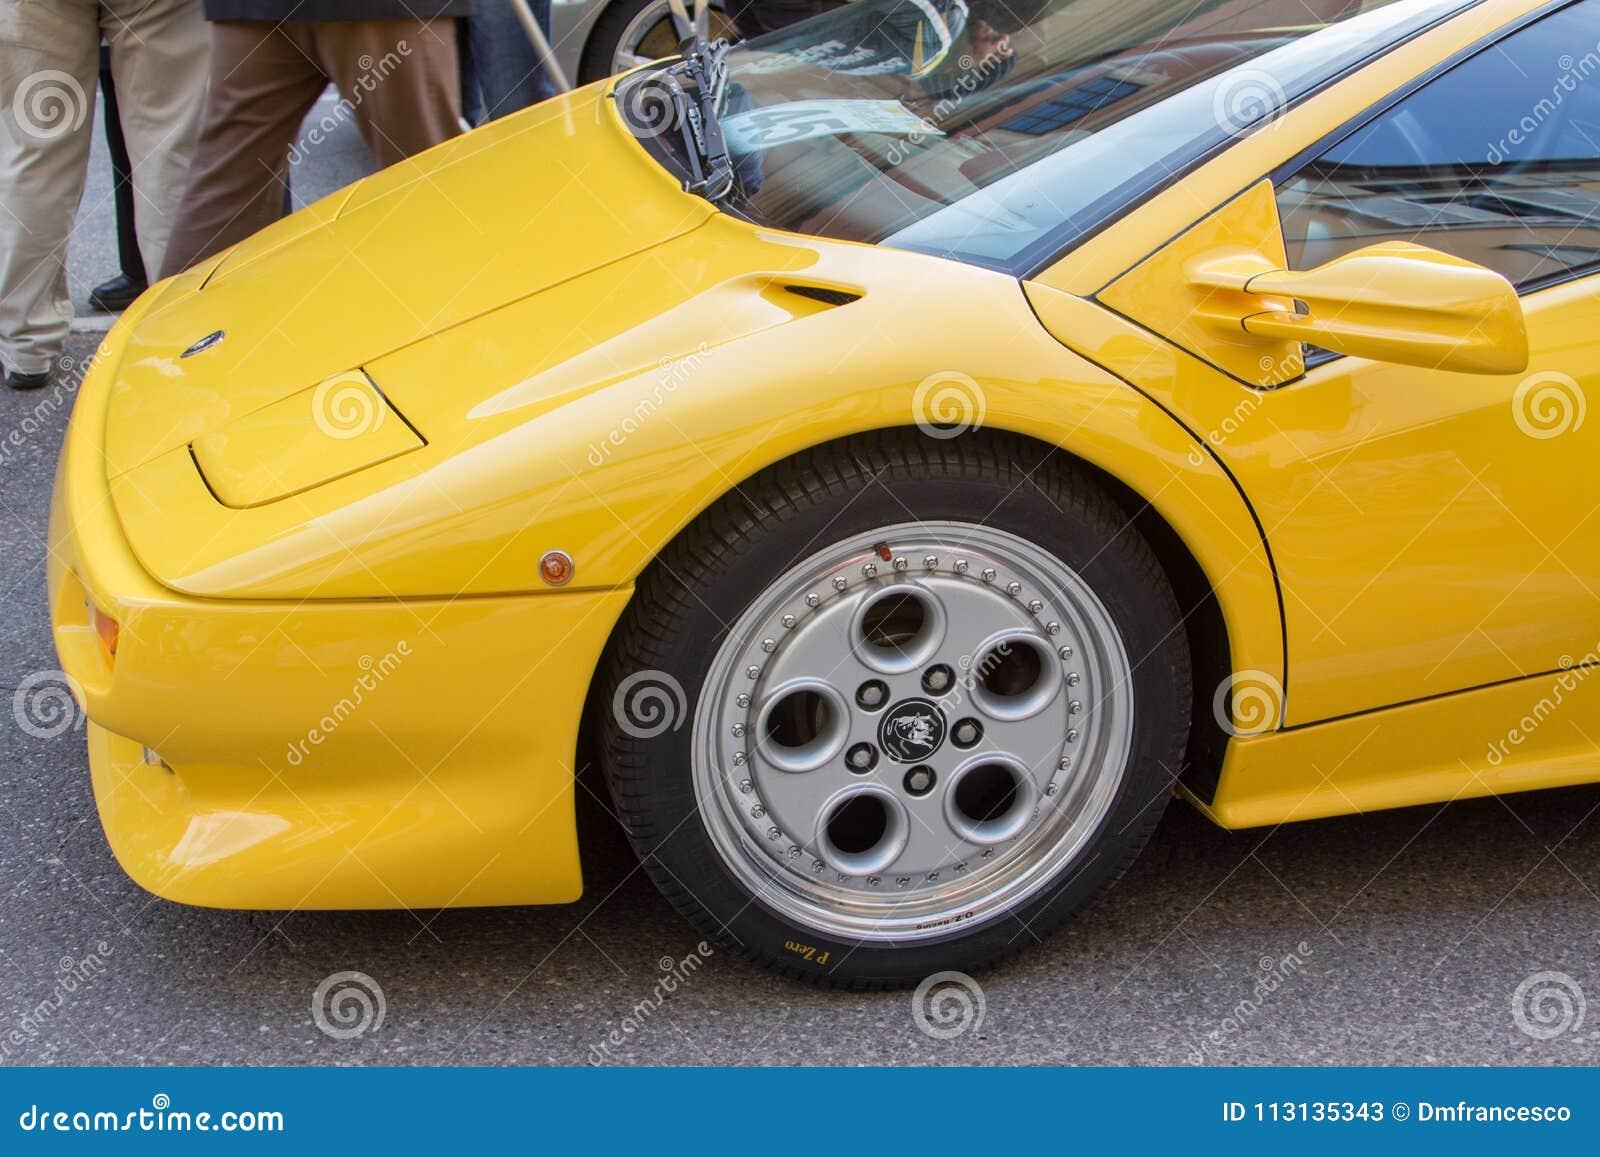 Super Sport Cars Maranello Italy Editorial Stock Photo Image Of